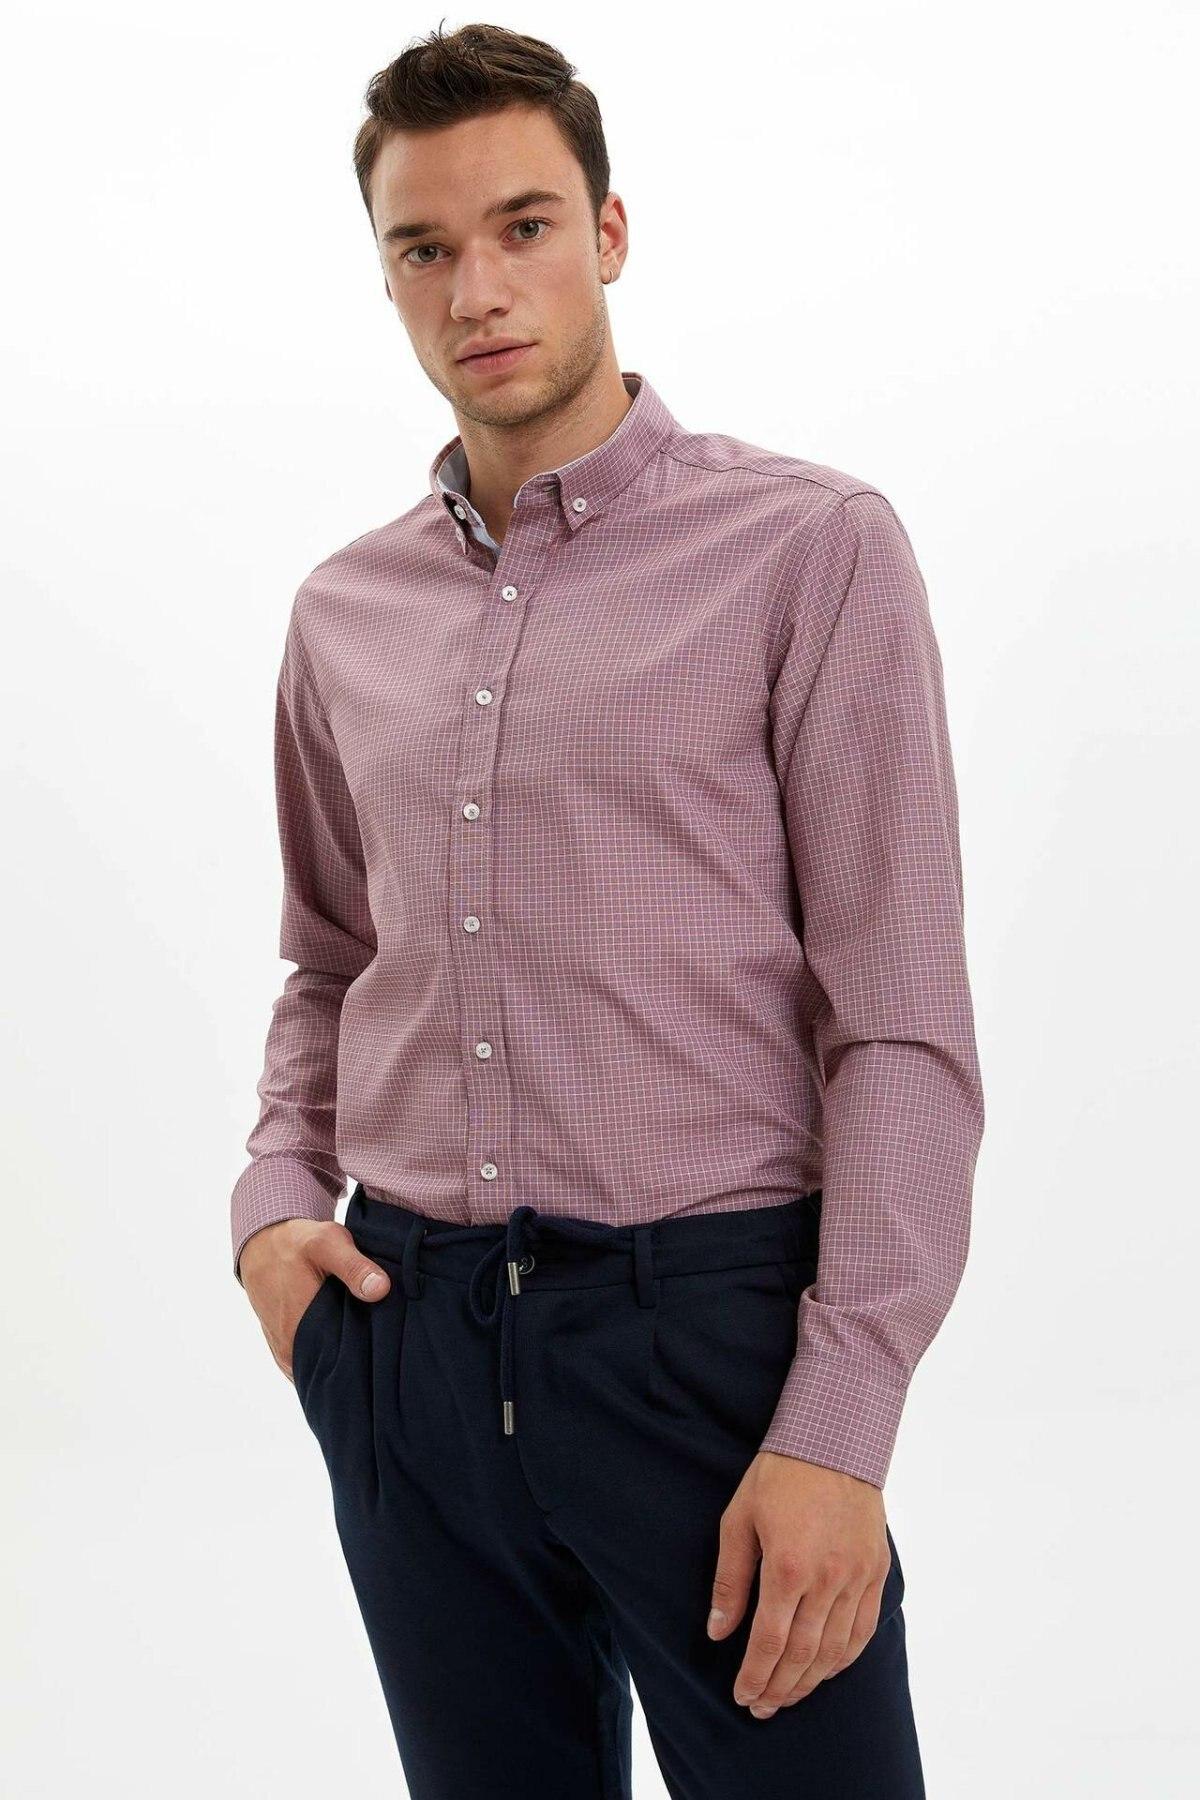 DeFacto Men Fashion Plaid Pattern Shirts Long Sleeve Shirts Mens Casual Lapel Collar Casual Shirt Tops New -L6077AZ19AU-L6077AZ19AU